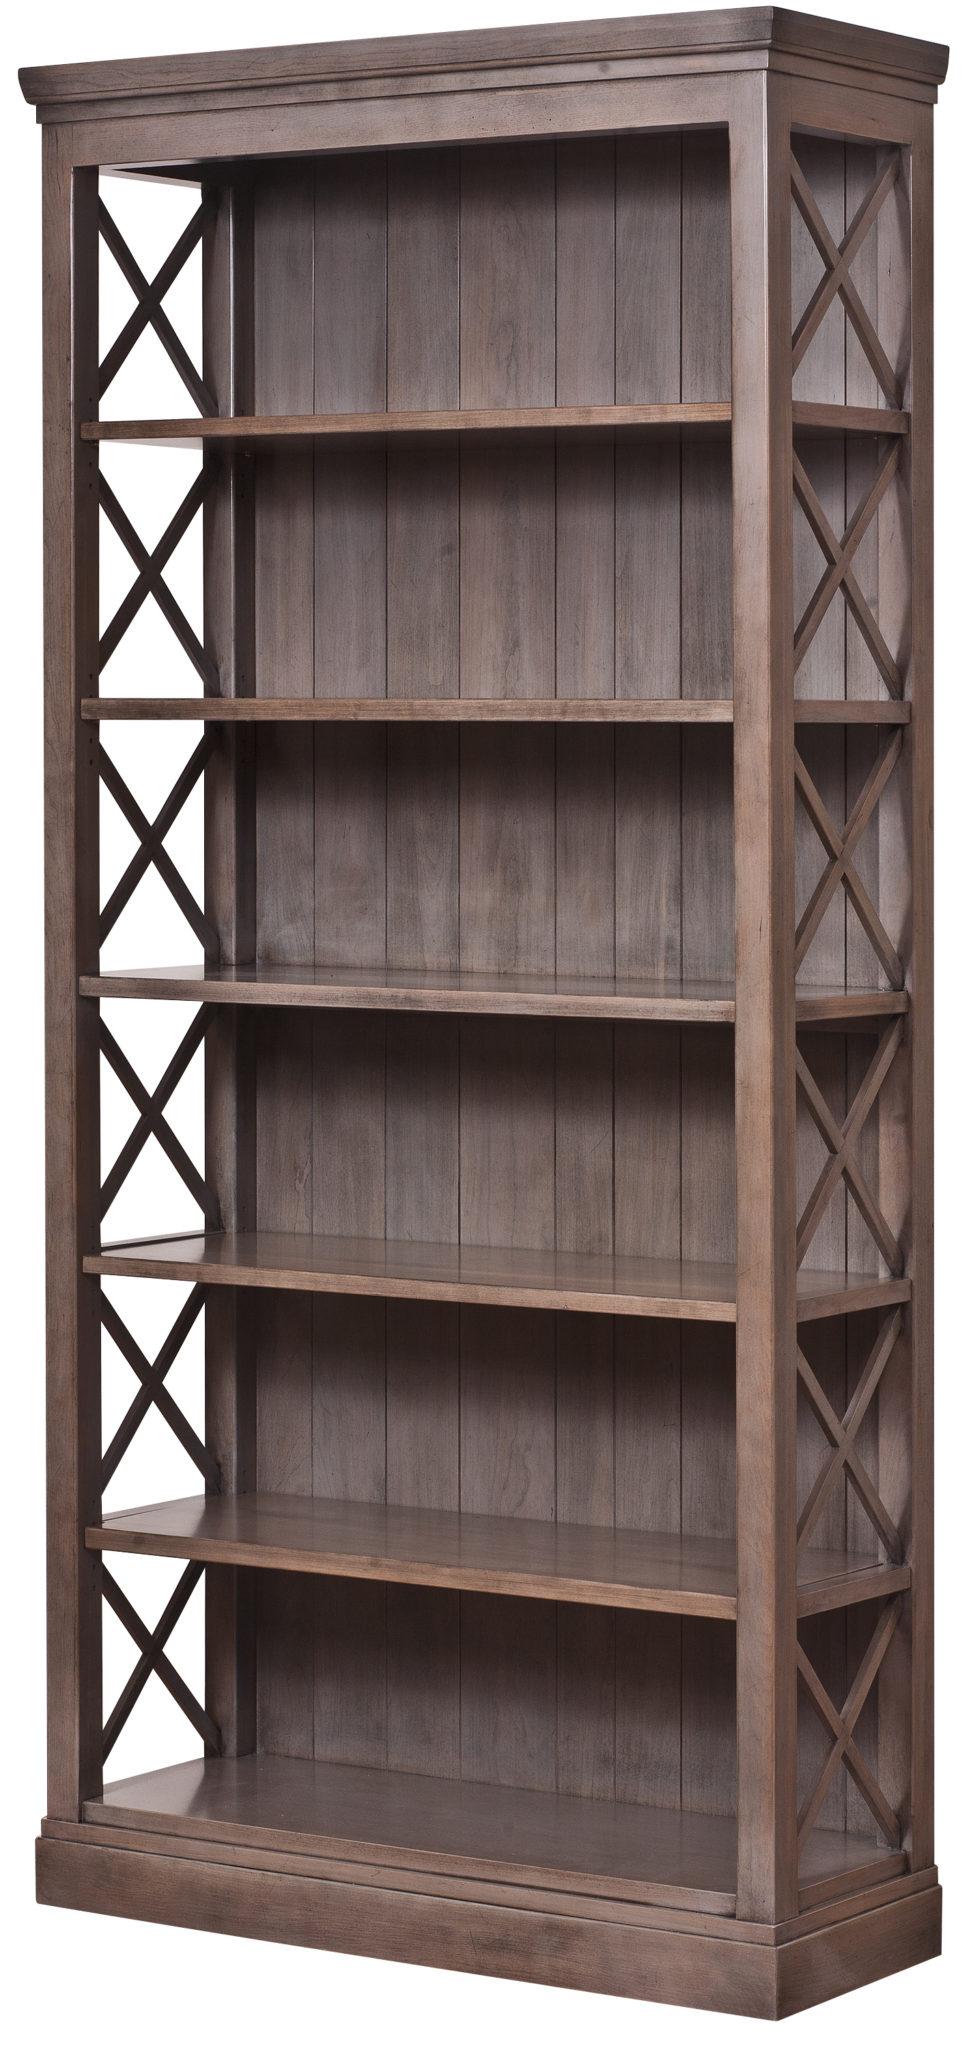 Large Taylor Bookcase Image